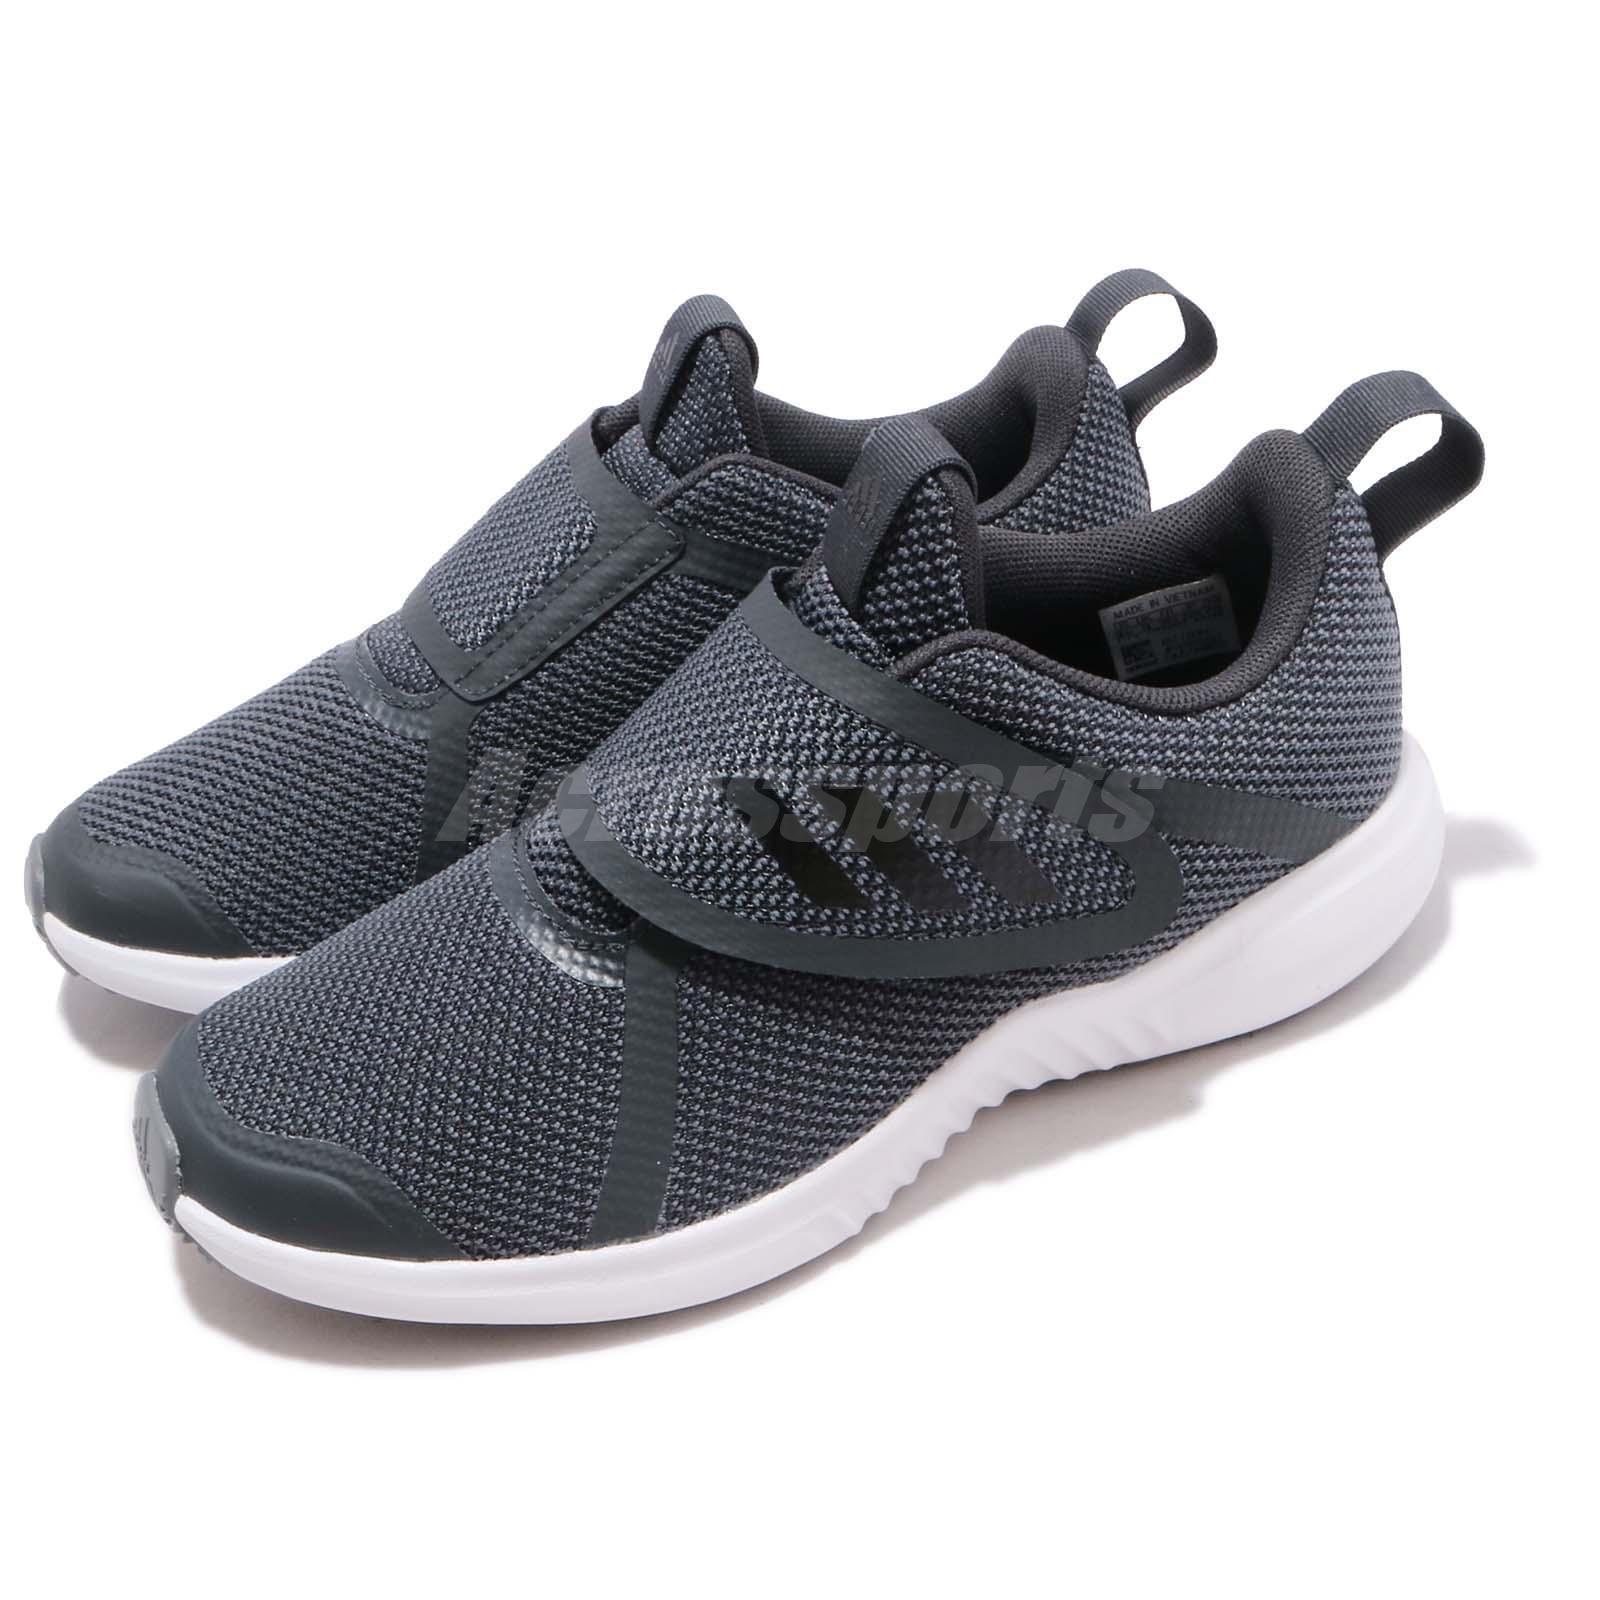 Adidas FortaRun  X CF K grigio bianca Kid Preschool Slip on scarpe scarpe da ginnastica F36194  stile classico